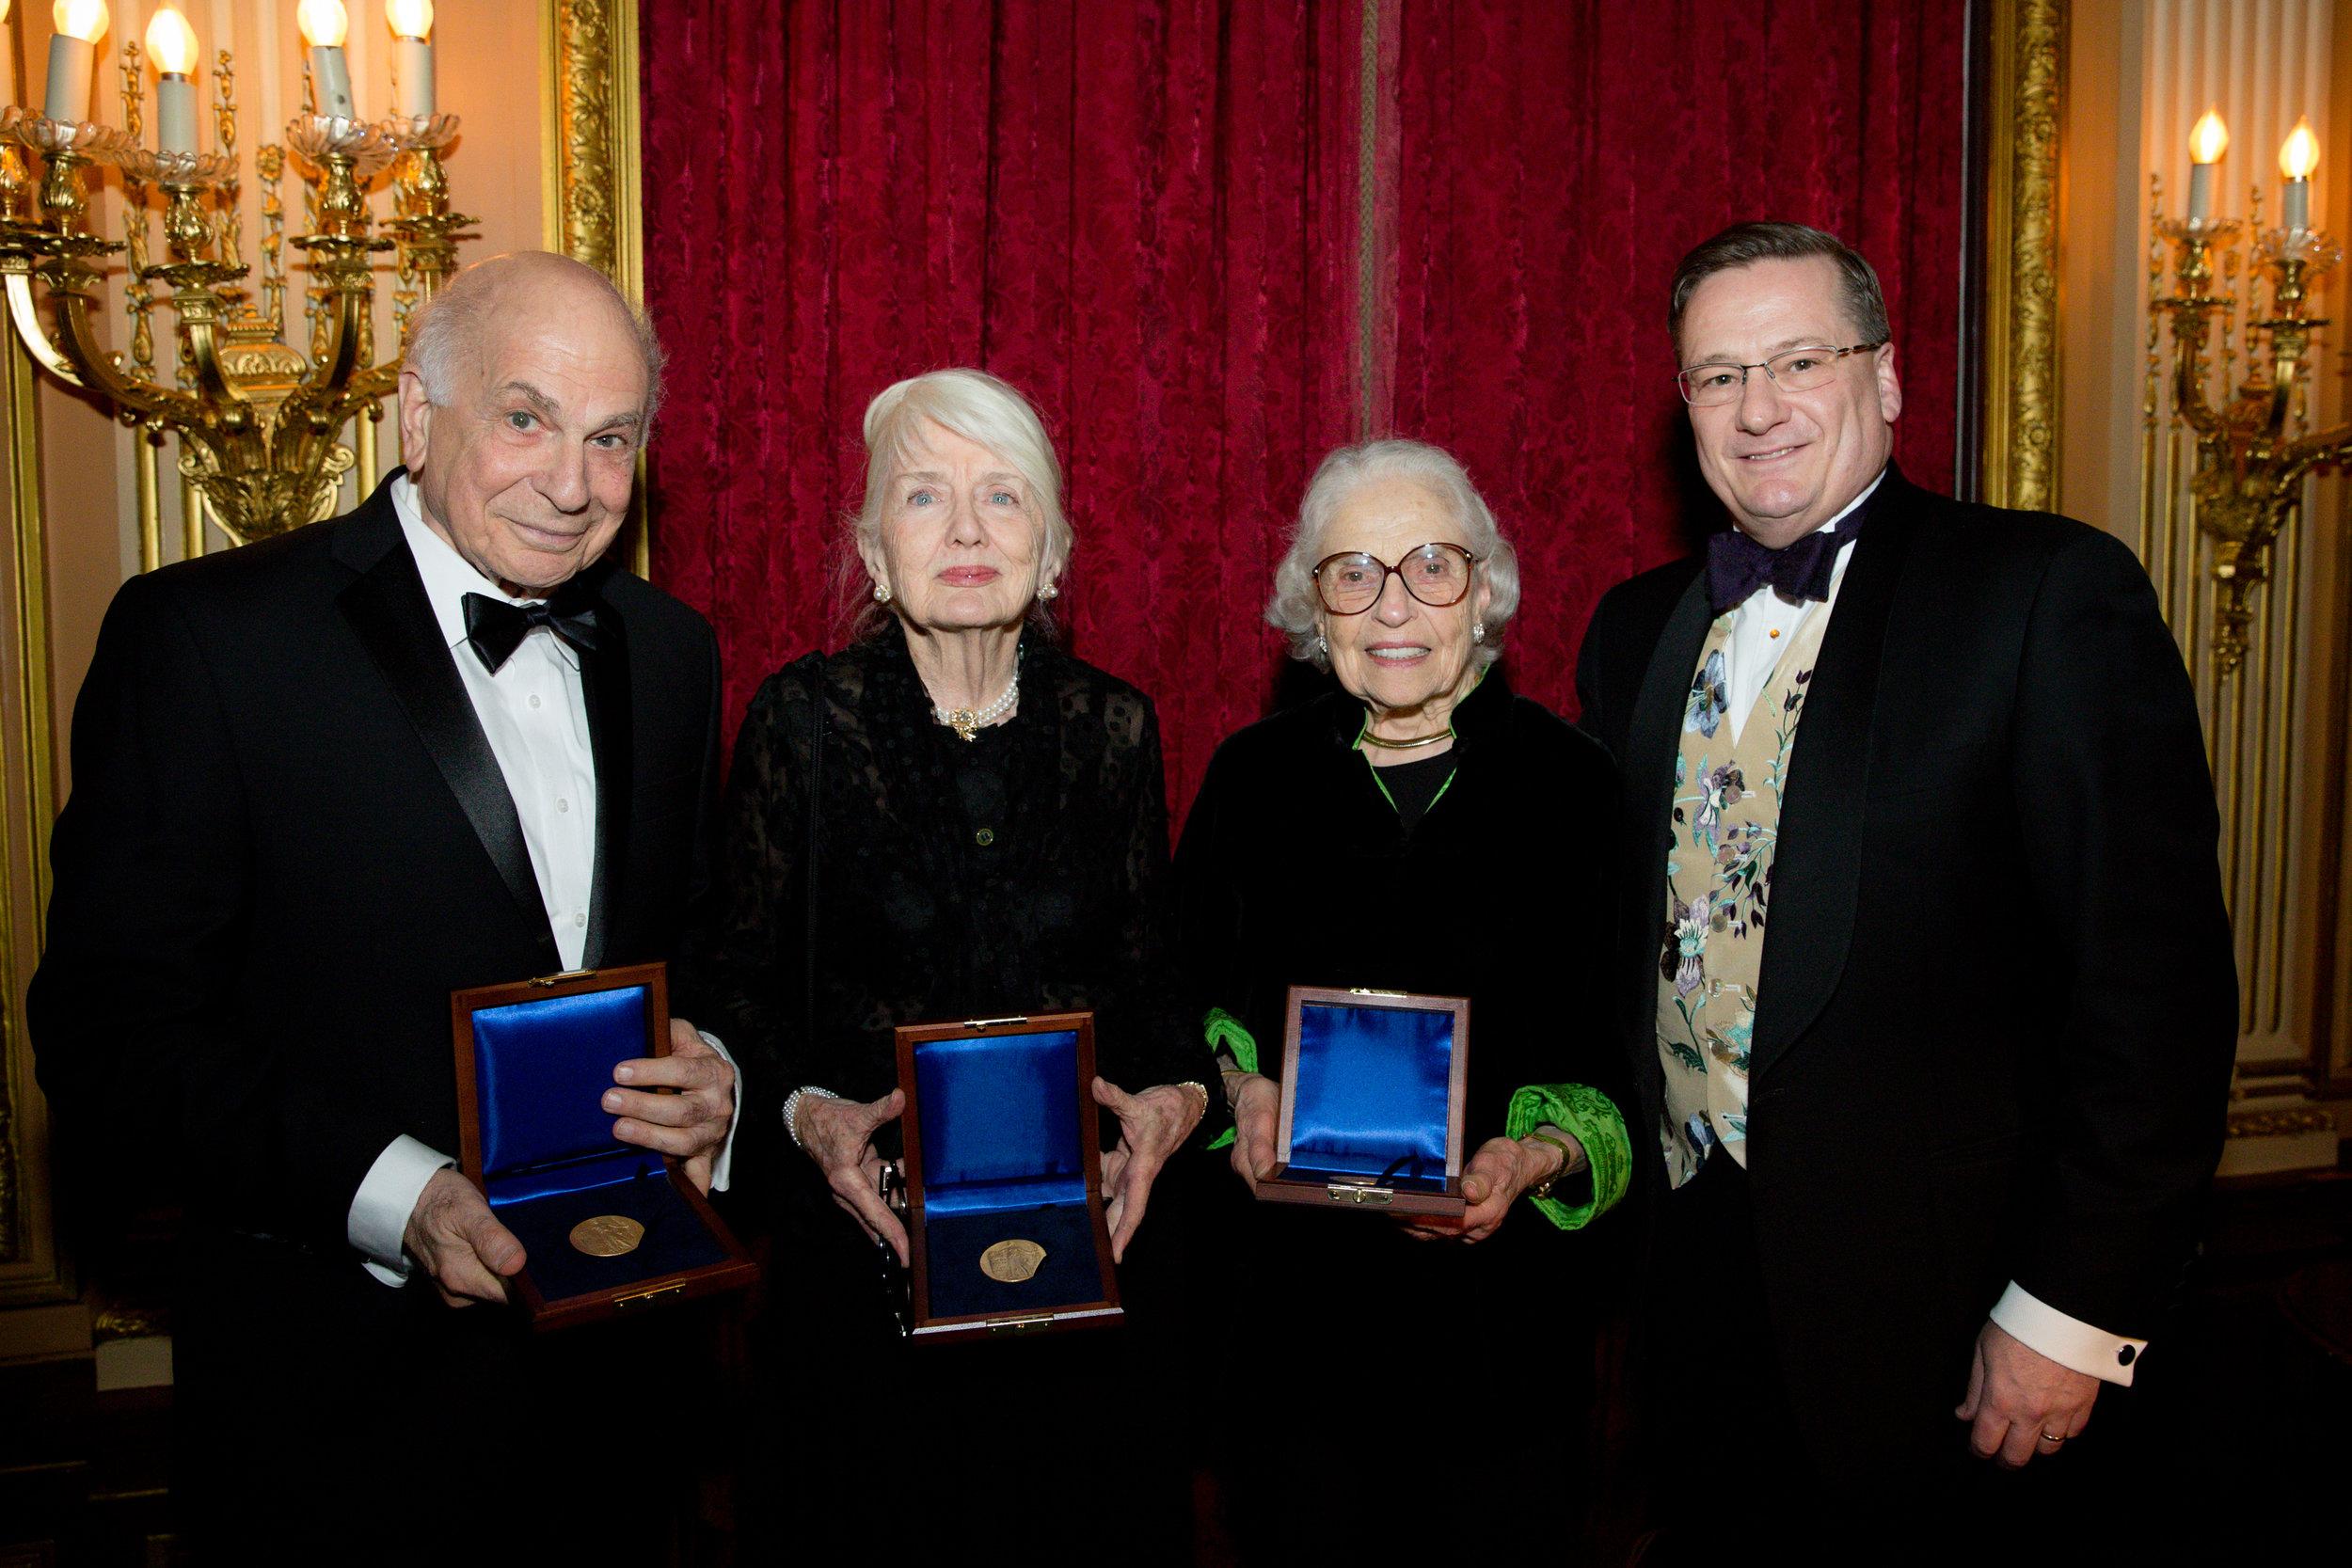 Daniel Kahneman, Geraldine Kunstadter, Betsy Rogers, and Fred Larsen at the 2018 Gold Medal Dinner